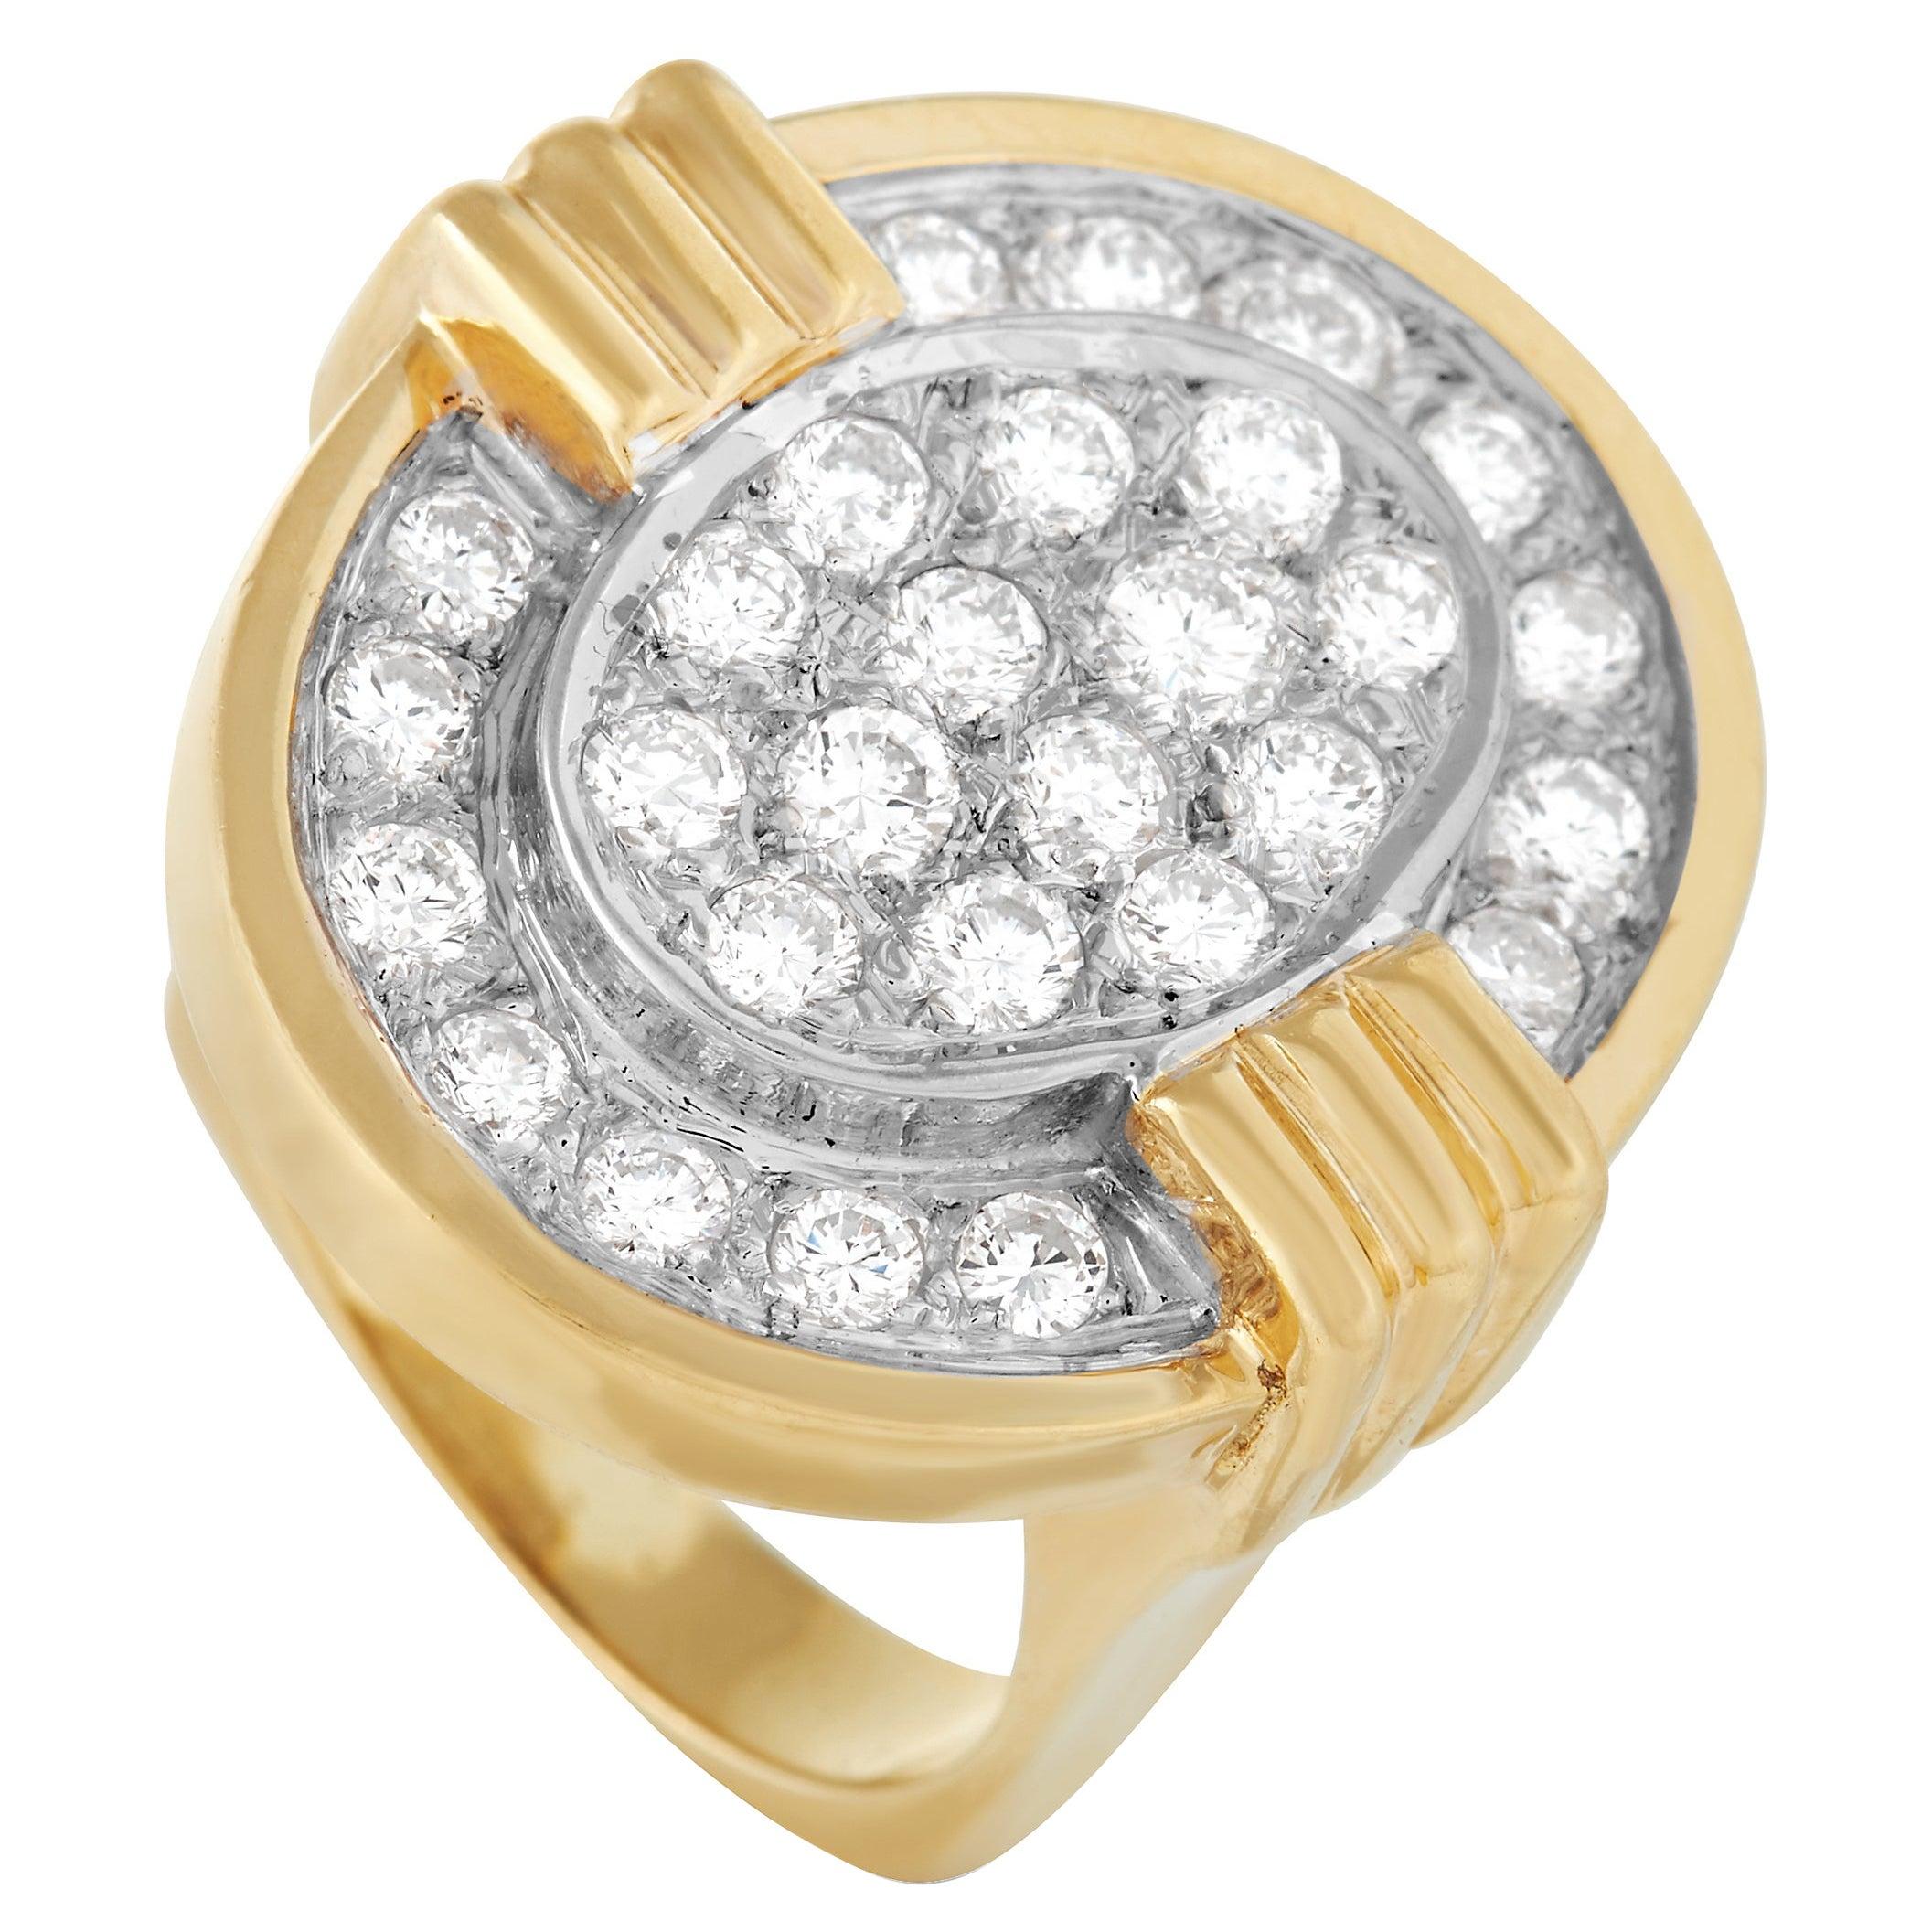 LB Exclusive 18K Yellow Gold 1.50 Ct Diamond Ring